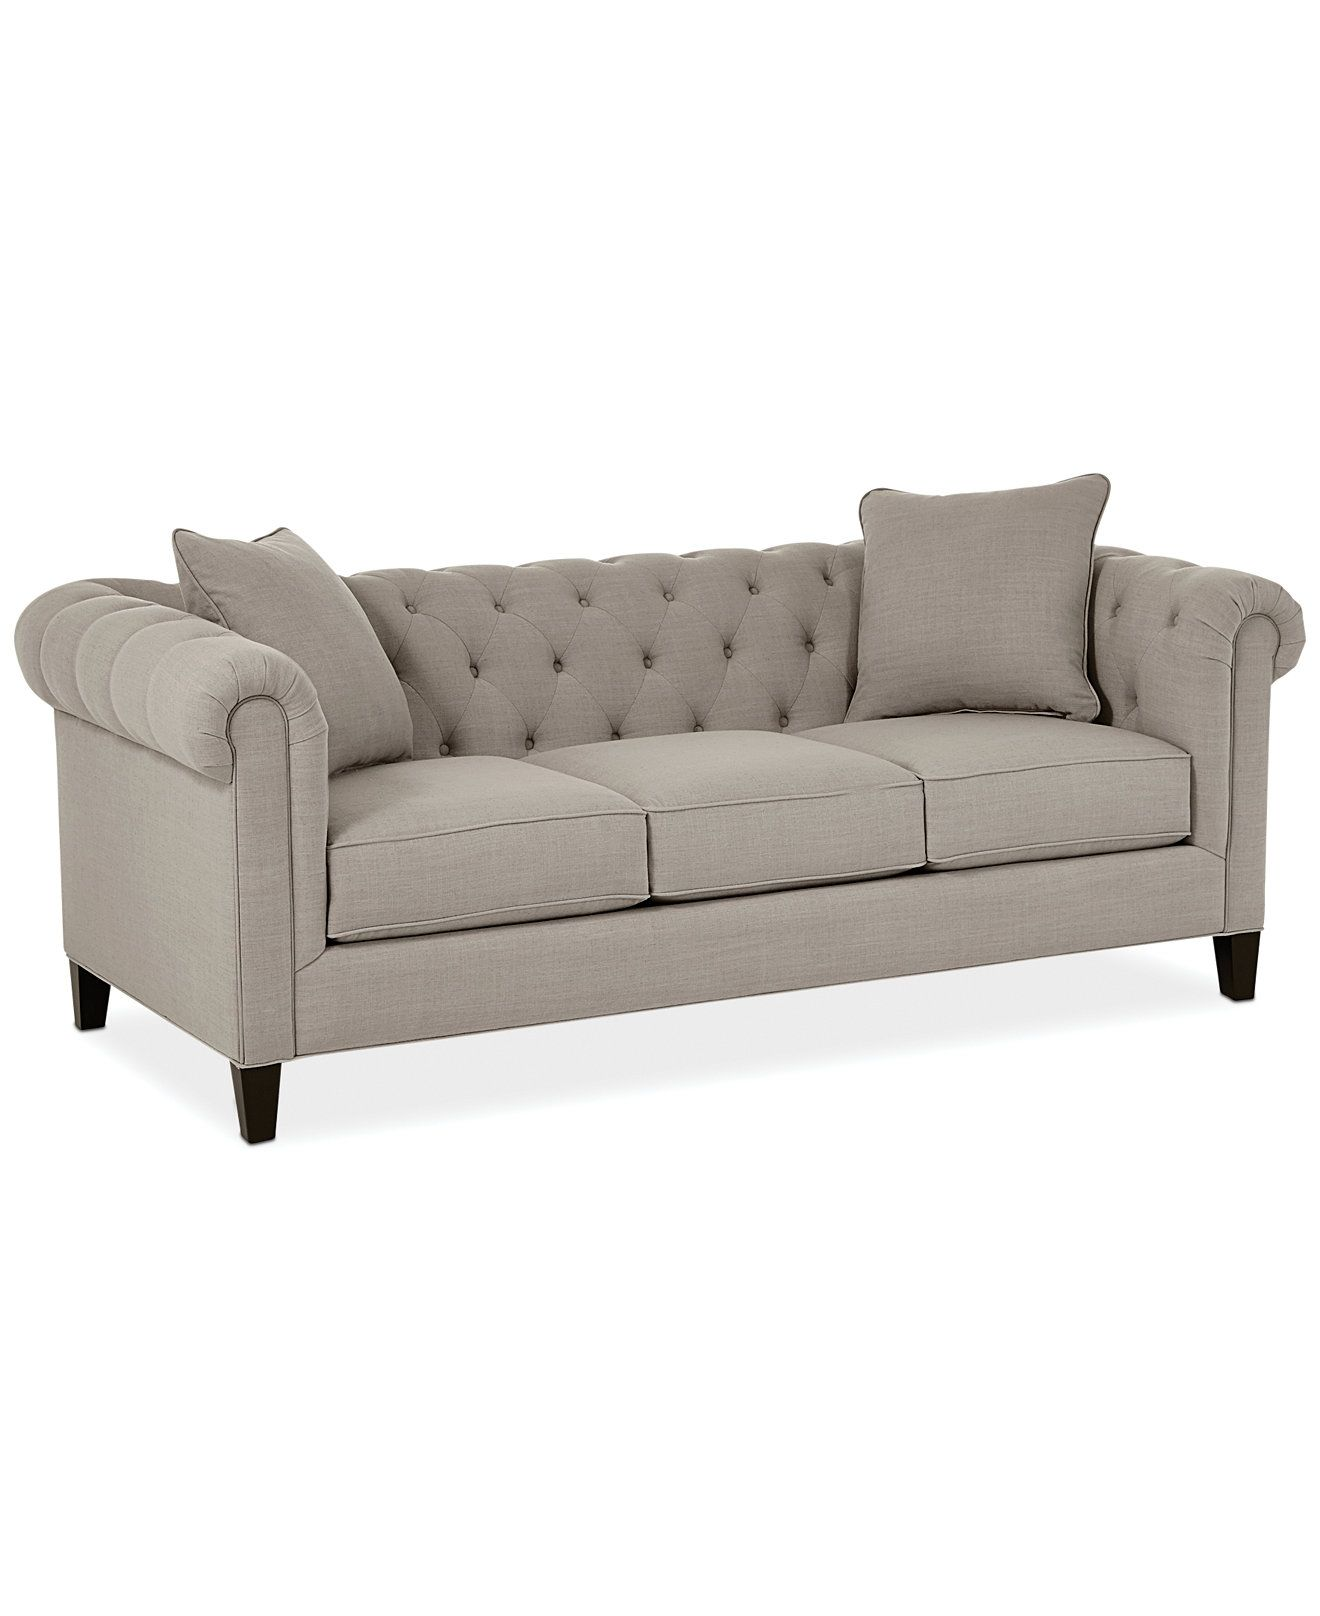 Rayna II Fabric Sofa Living Room Furniture Furniture Macy s